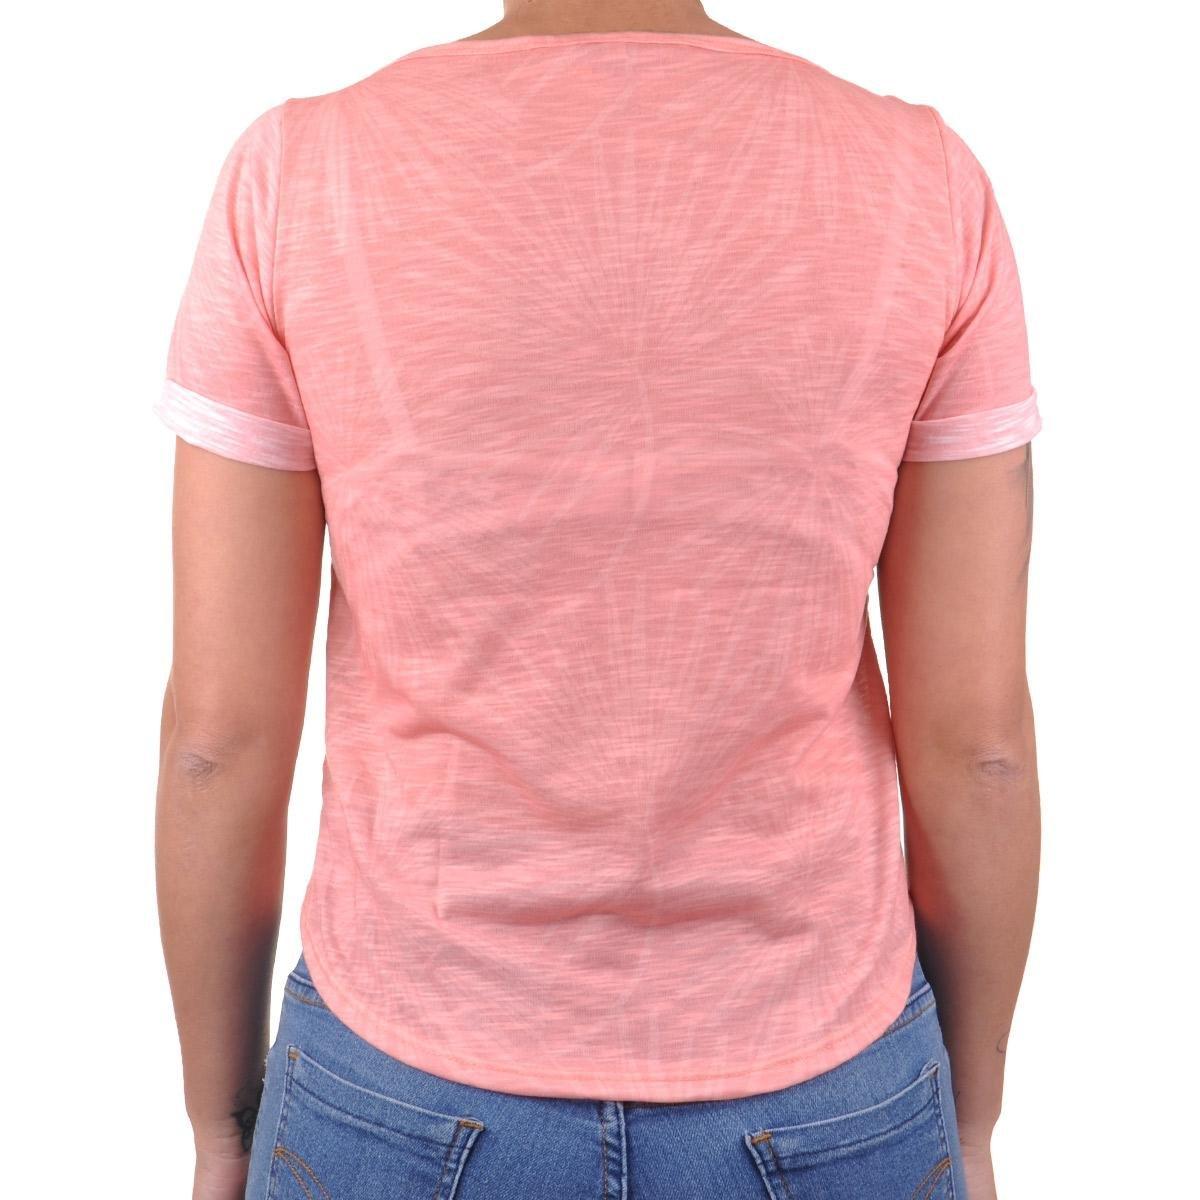 Cropped Palm Camiseta Cropped Claro Feminino Rosa Camiseta Oneill Oneill qwSgtSf